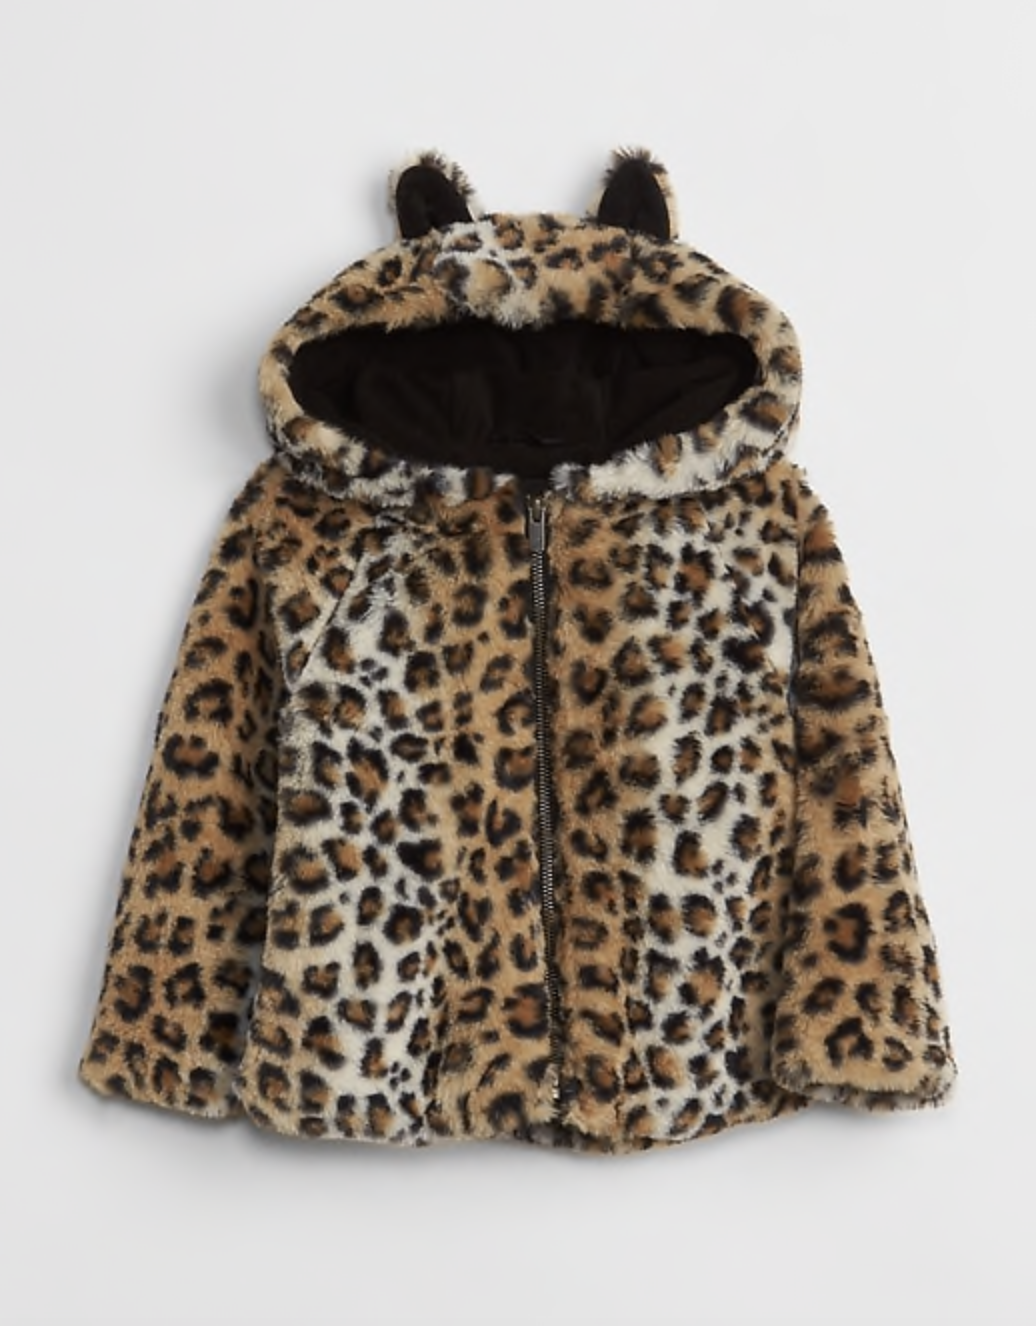 Gap Kids Leopard Faux-Fur Coat